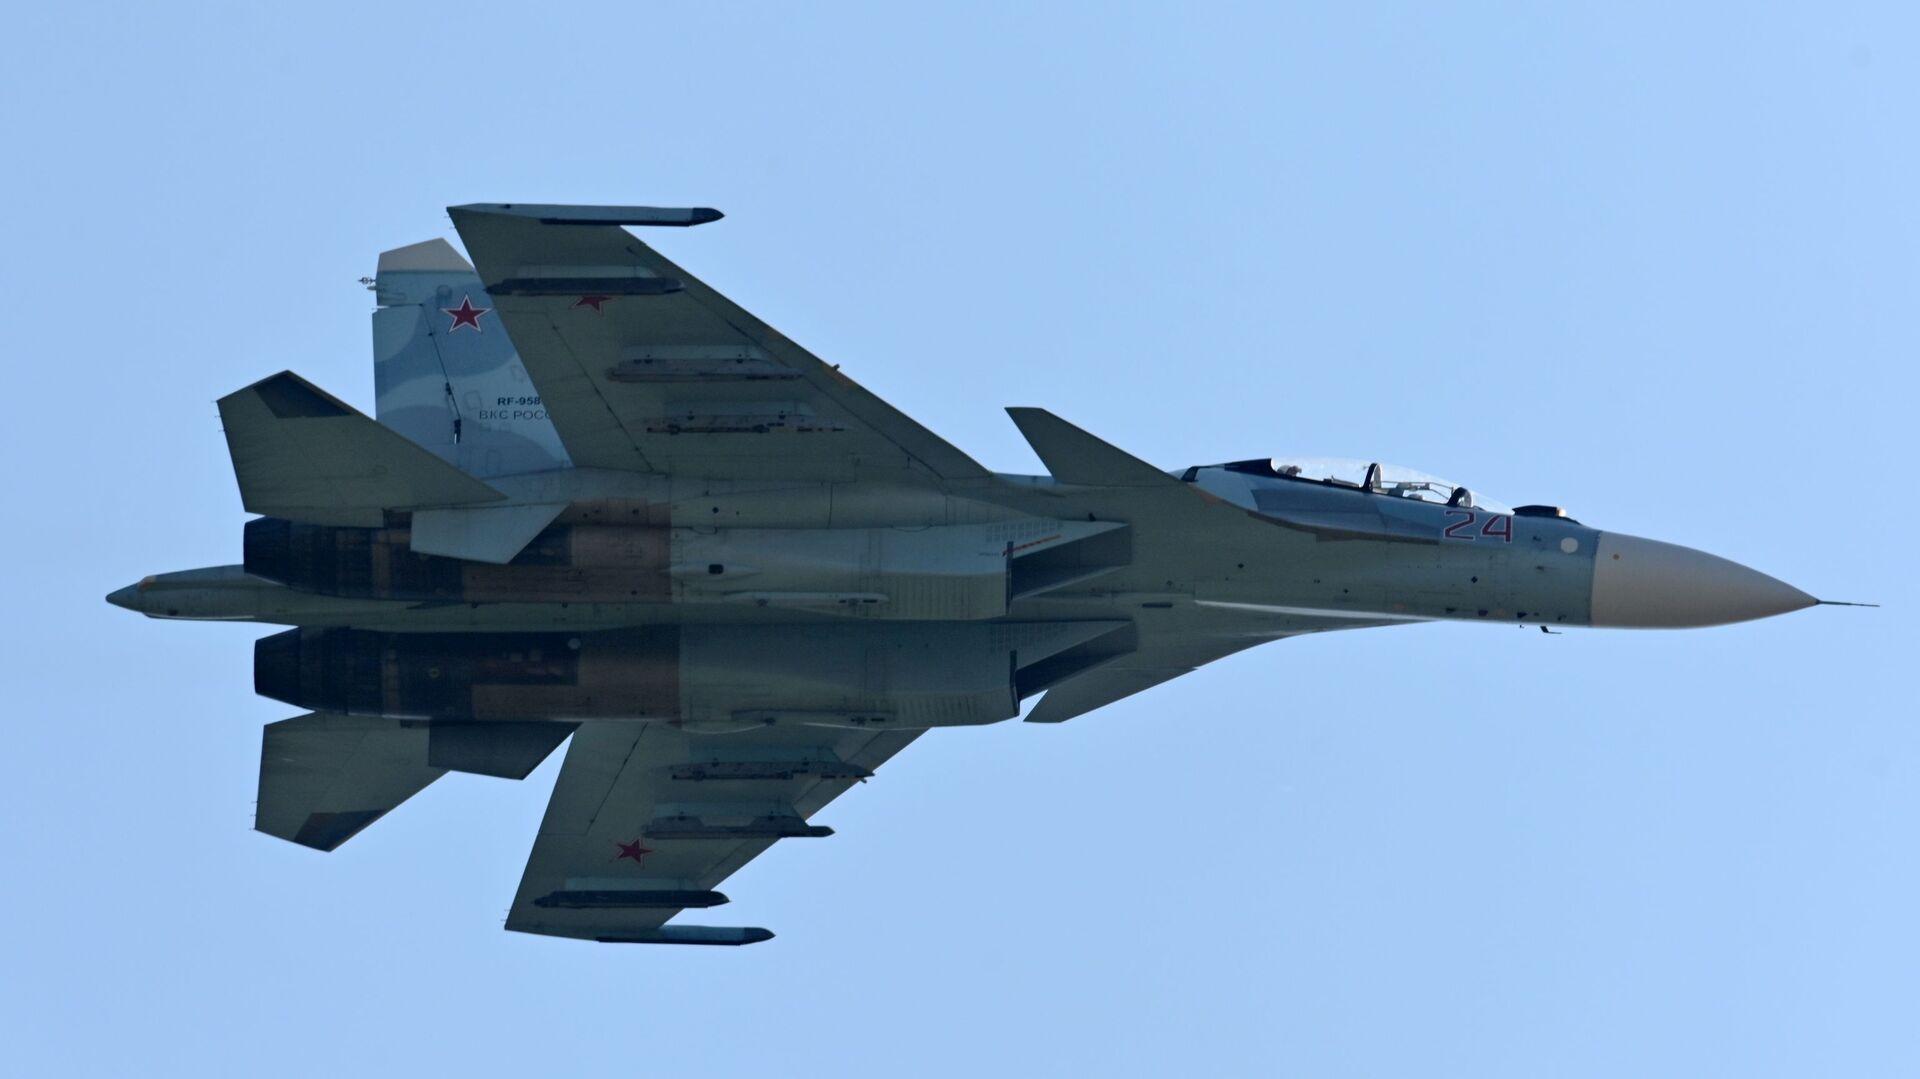 Un caza ruso Su-30SM  - Sputnik Mundo, 1920, 23.06.2021